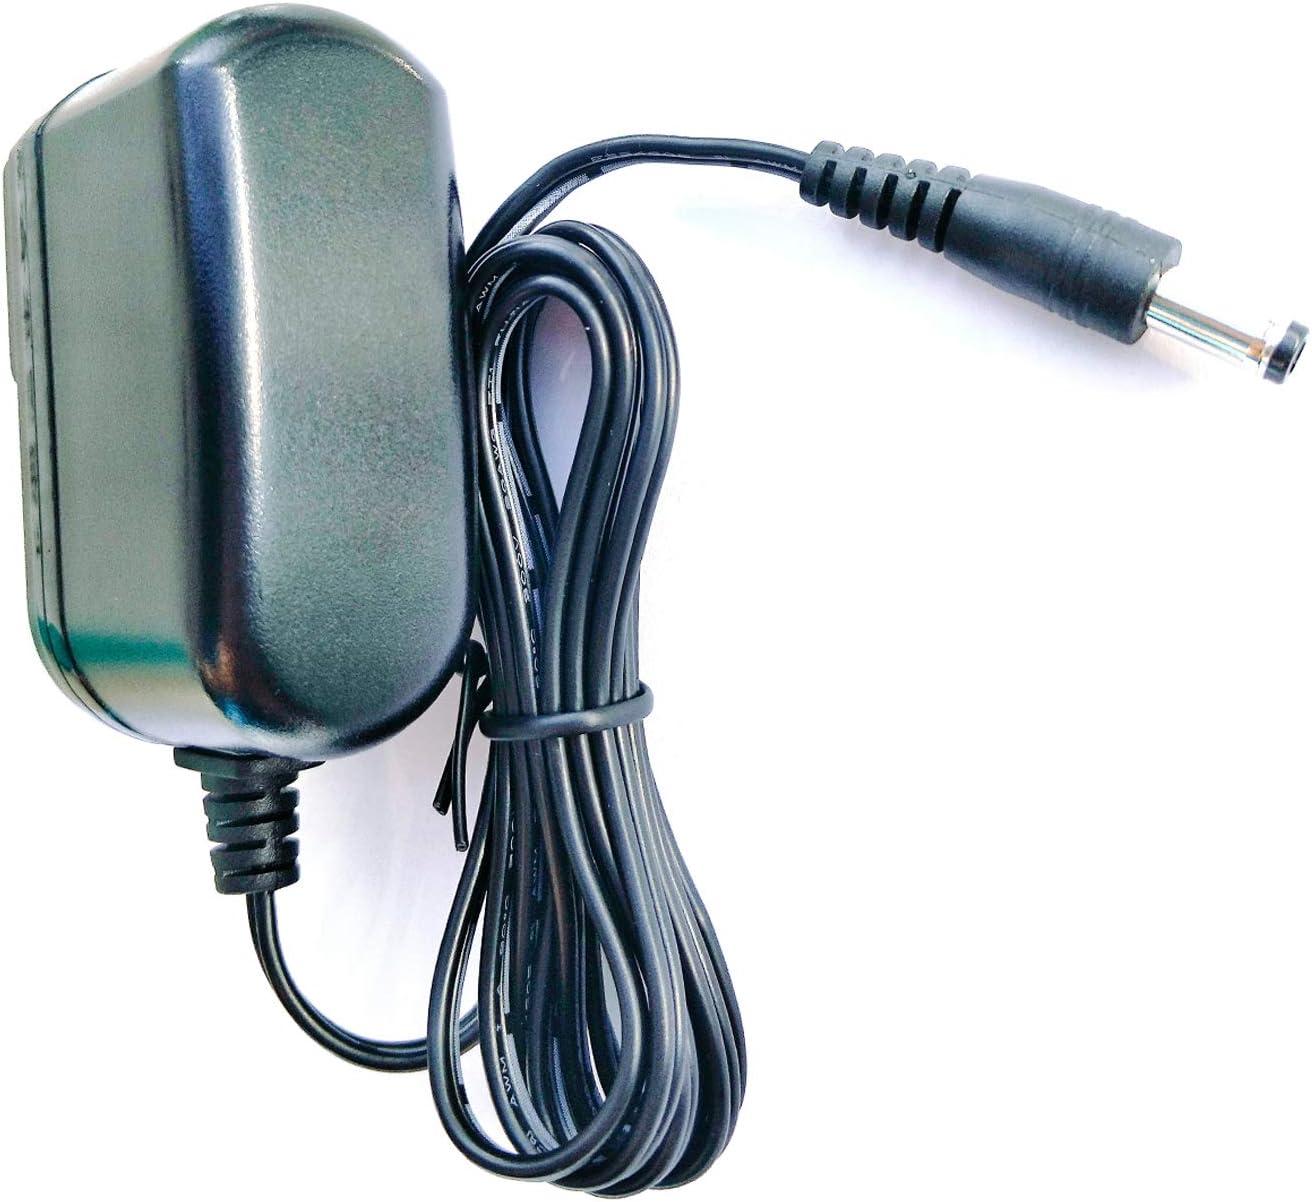 AC Adapter Power Supply for HealthRider Elliptical  C535e HREL329070